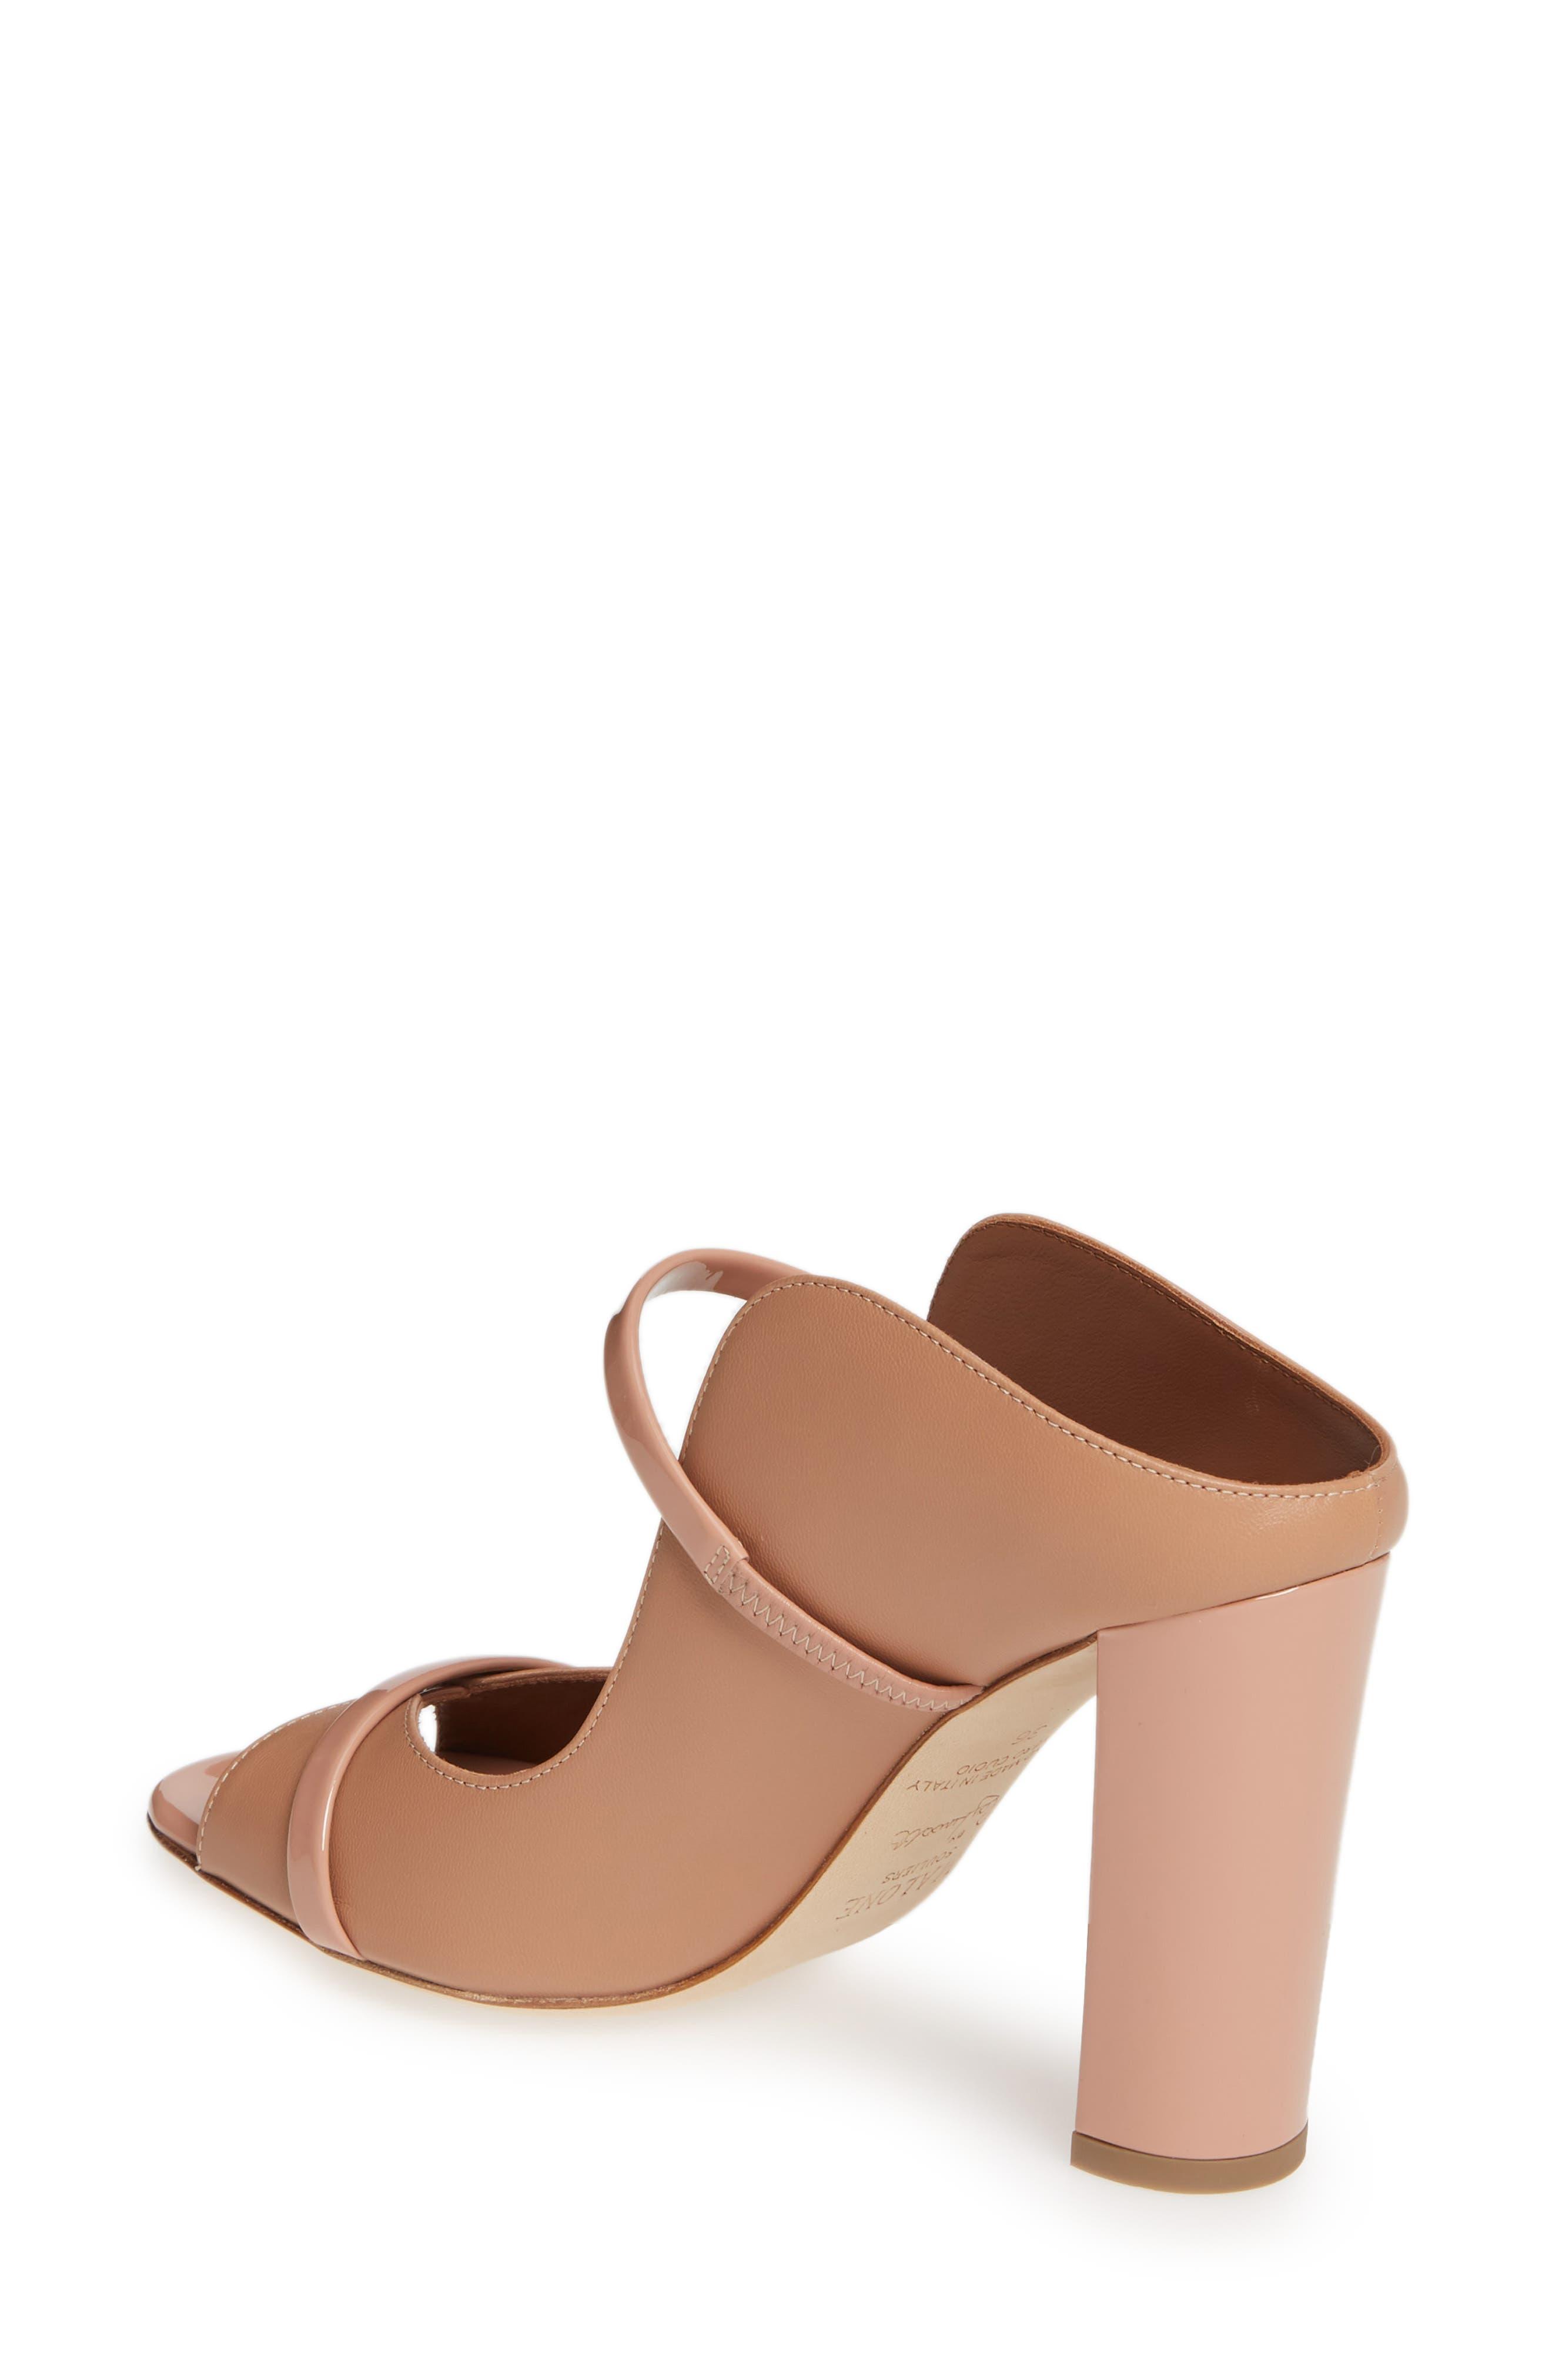 MALONE SOULIERS,                             Norah Block Heel Sandal,                             Alternate thumbnail 2, color,                             NUDE/ BLUSH